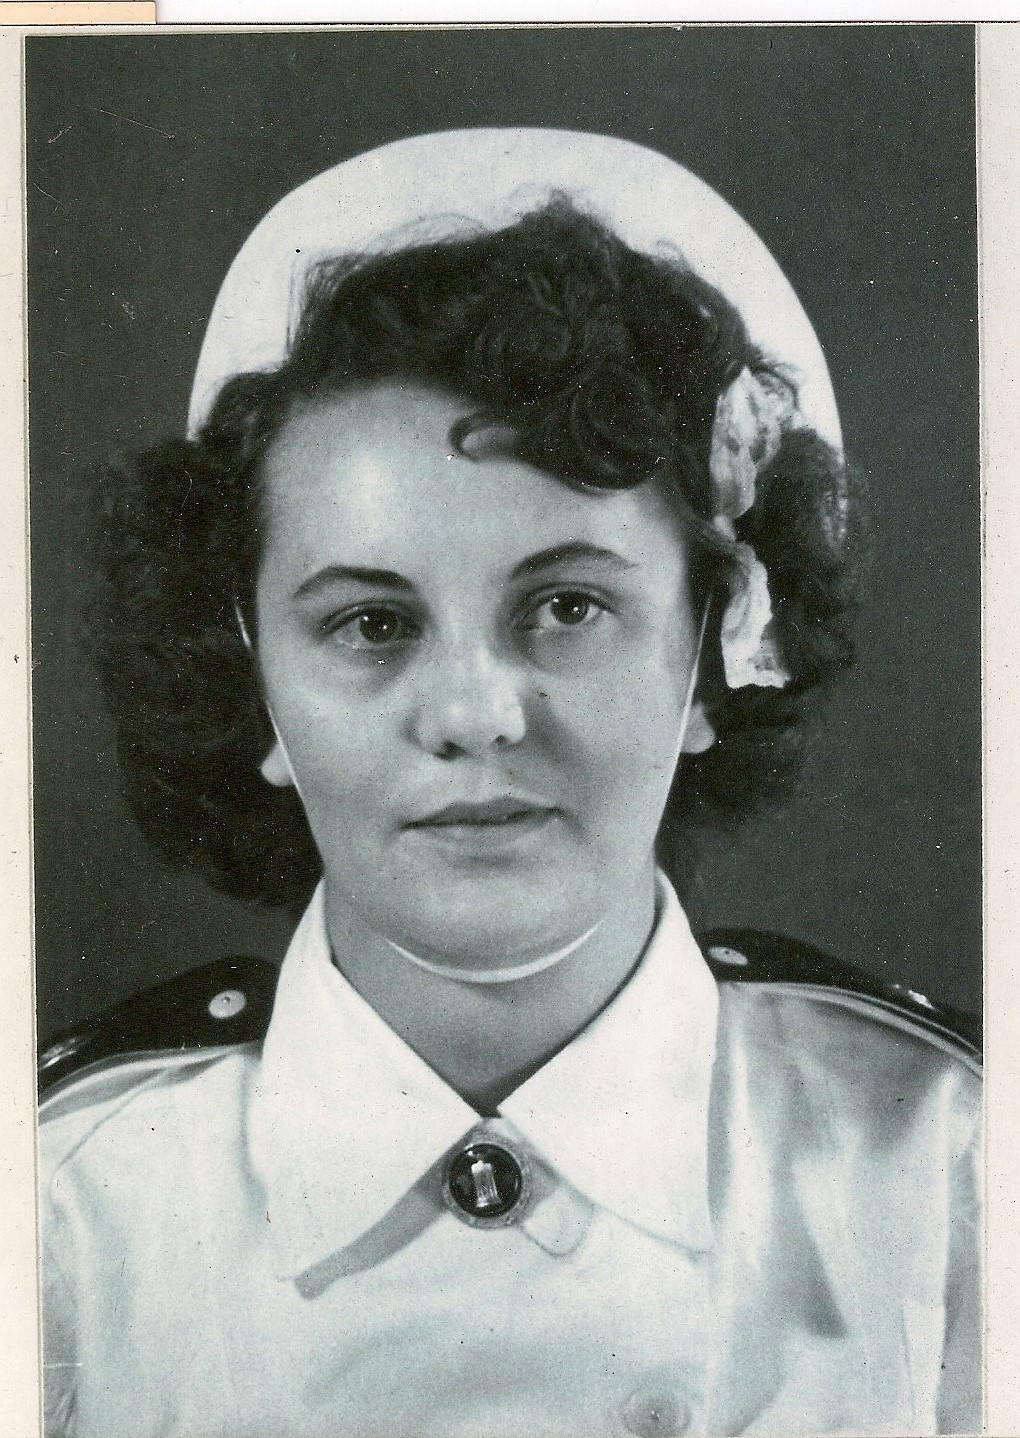 Sr. Mary Bland Boksburg